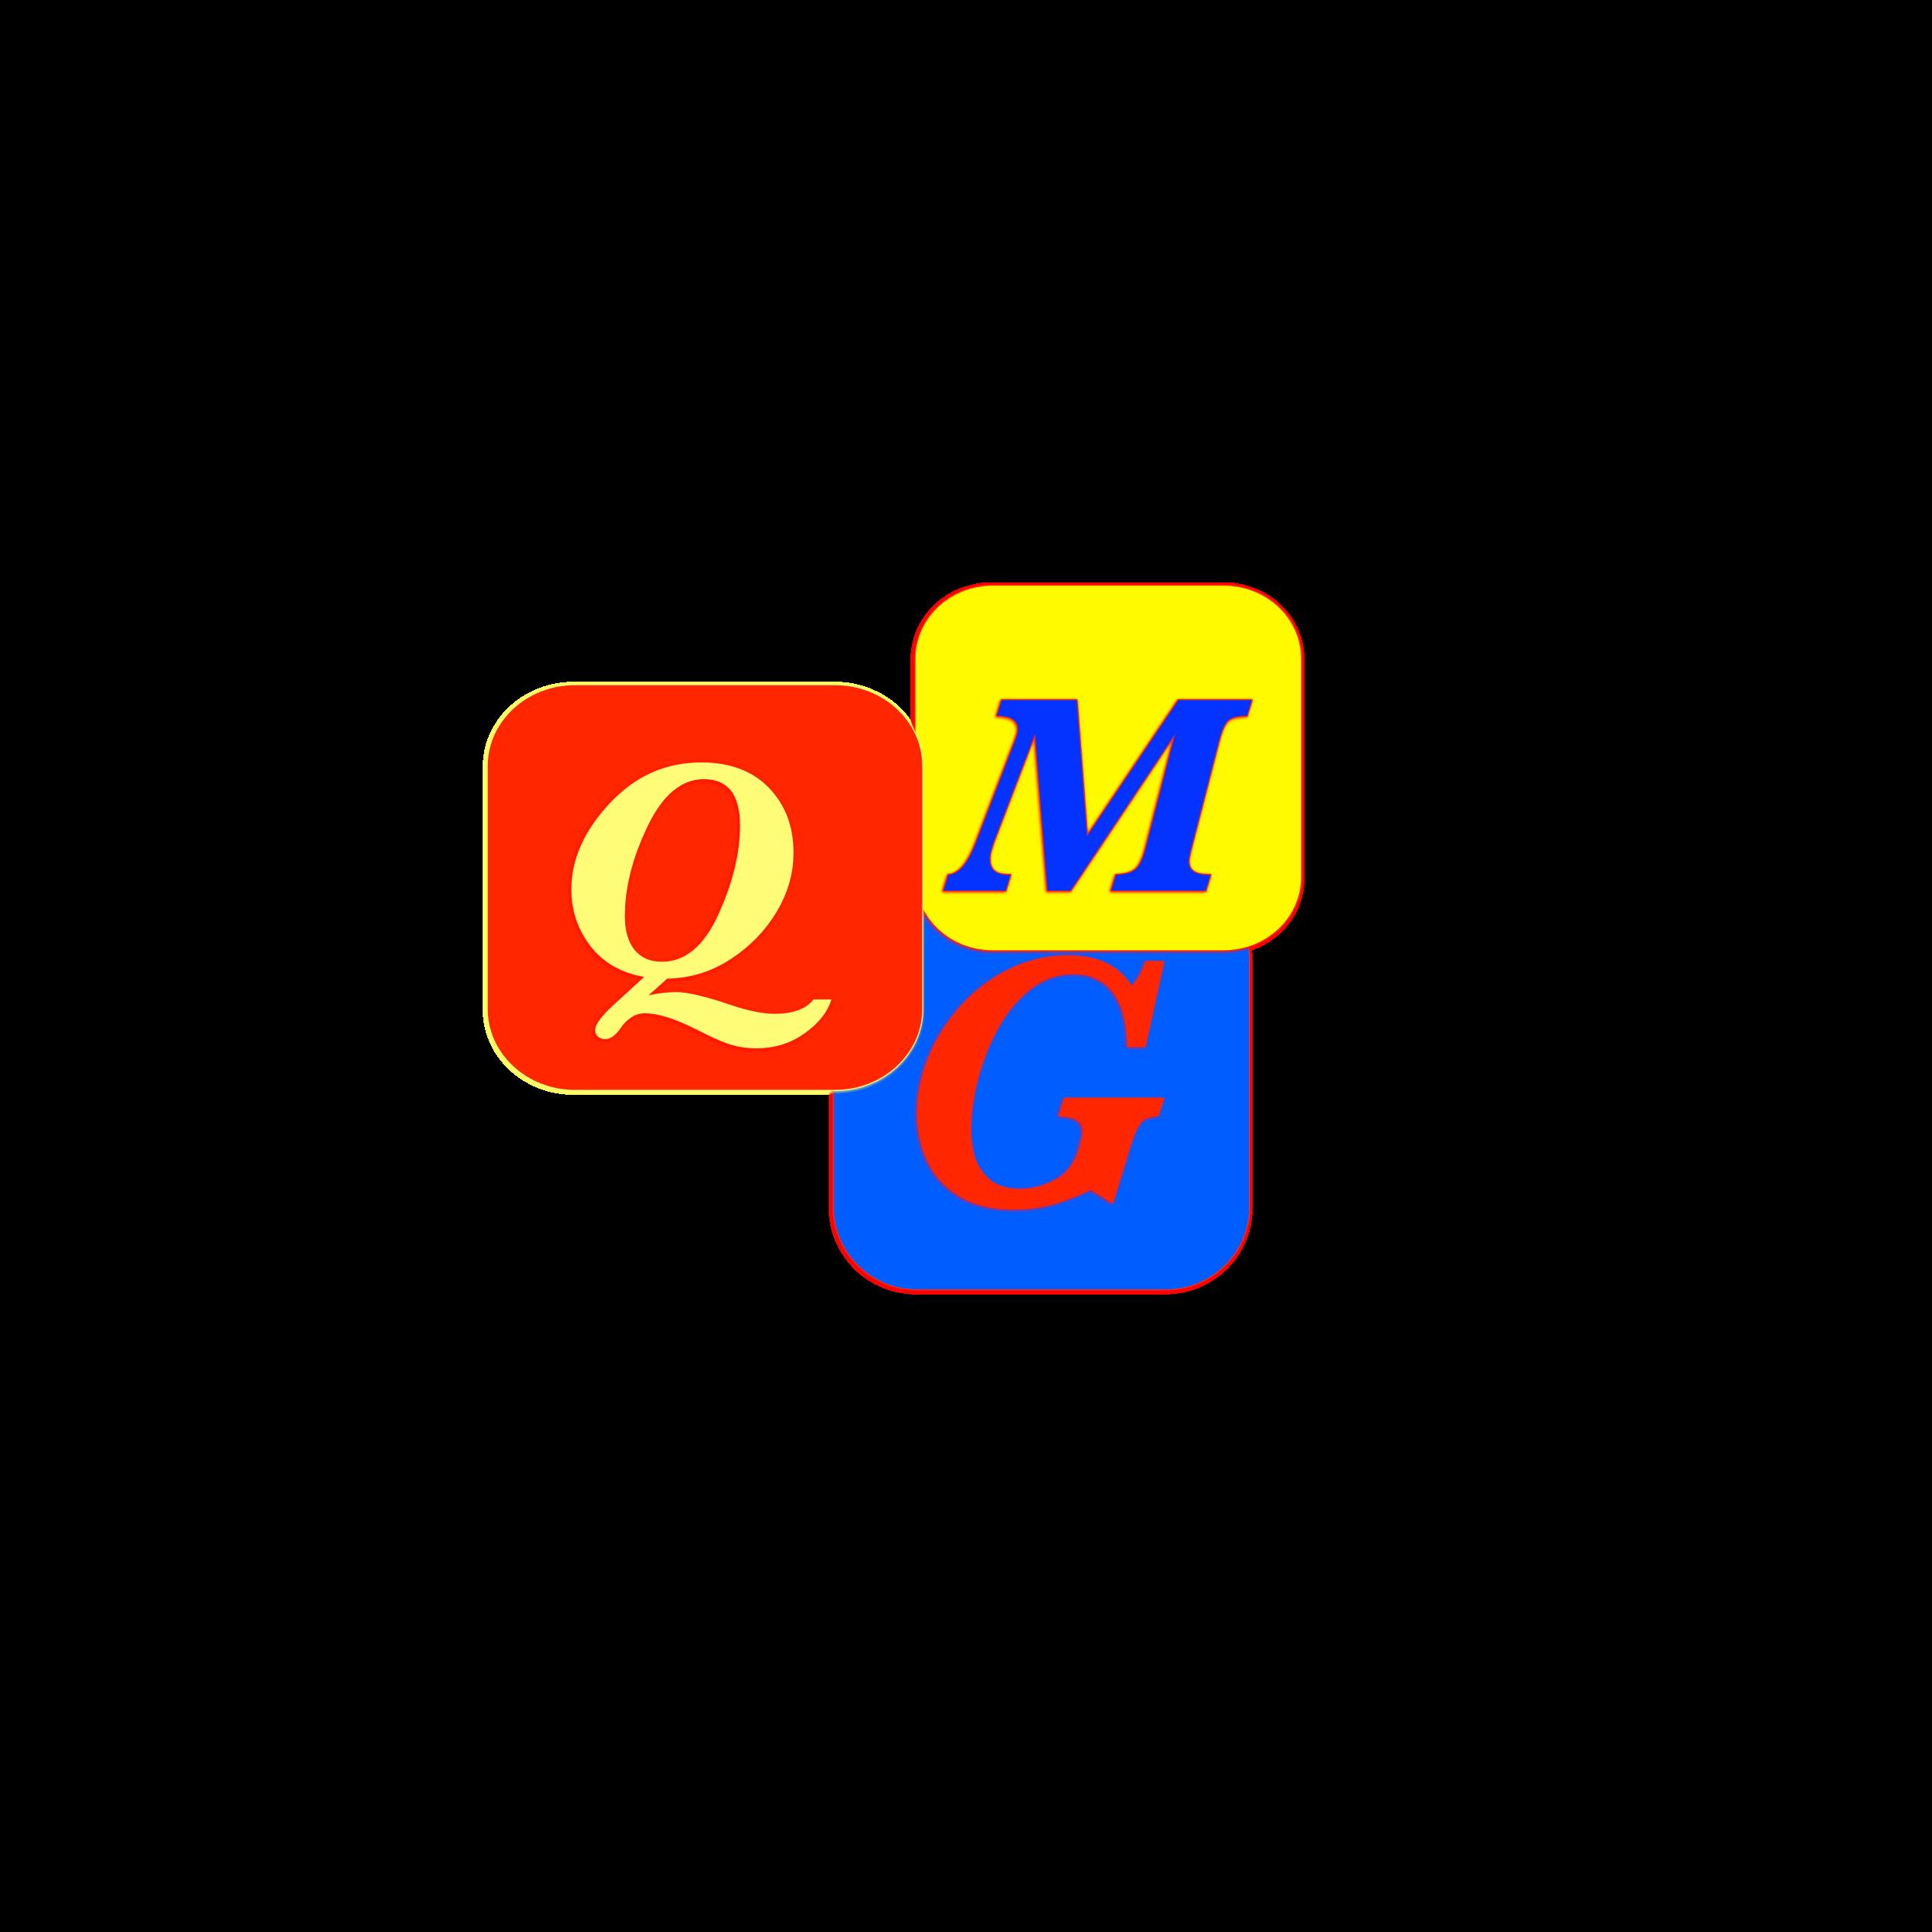 QMG Cleaning Service LLC